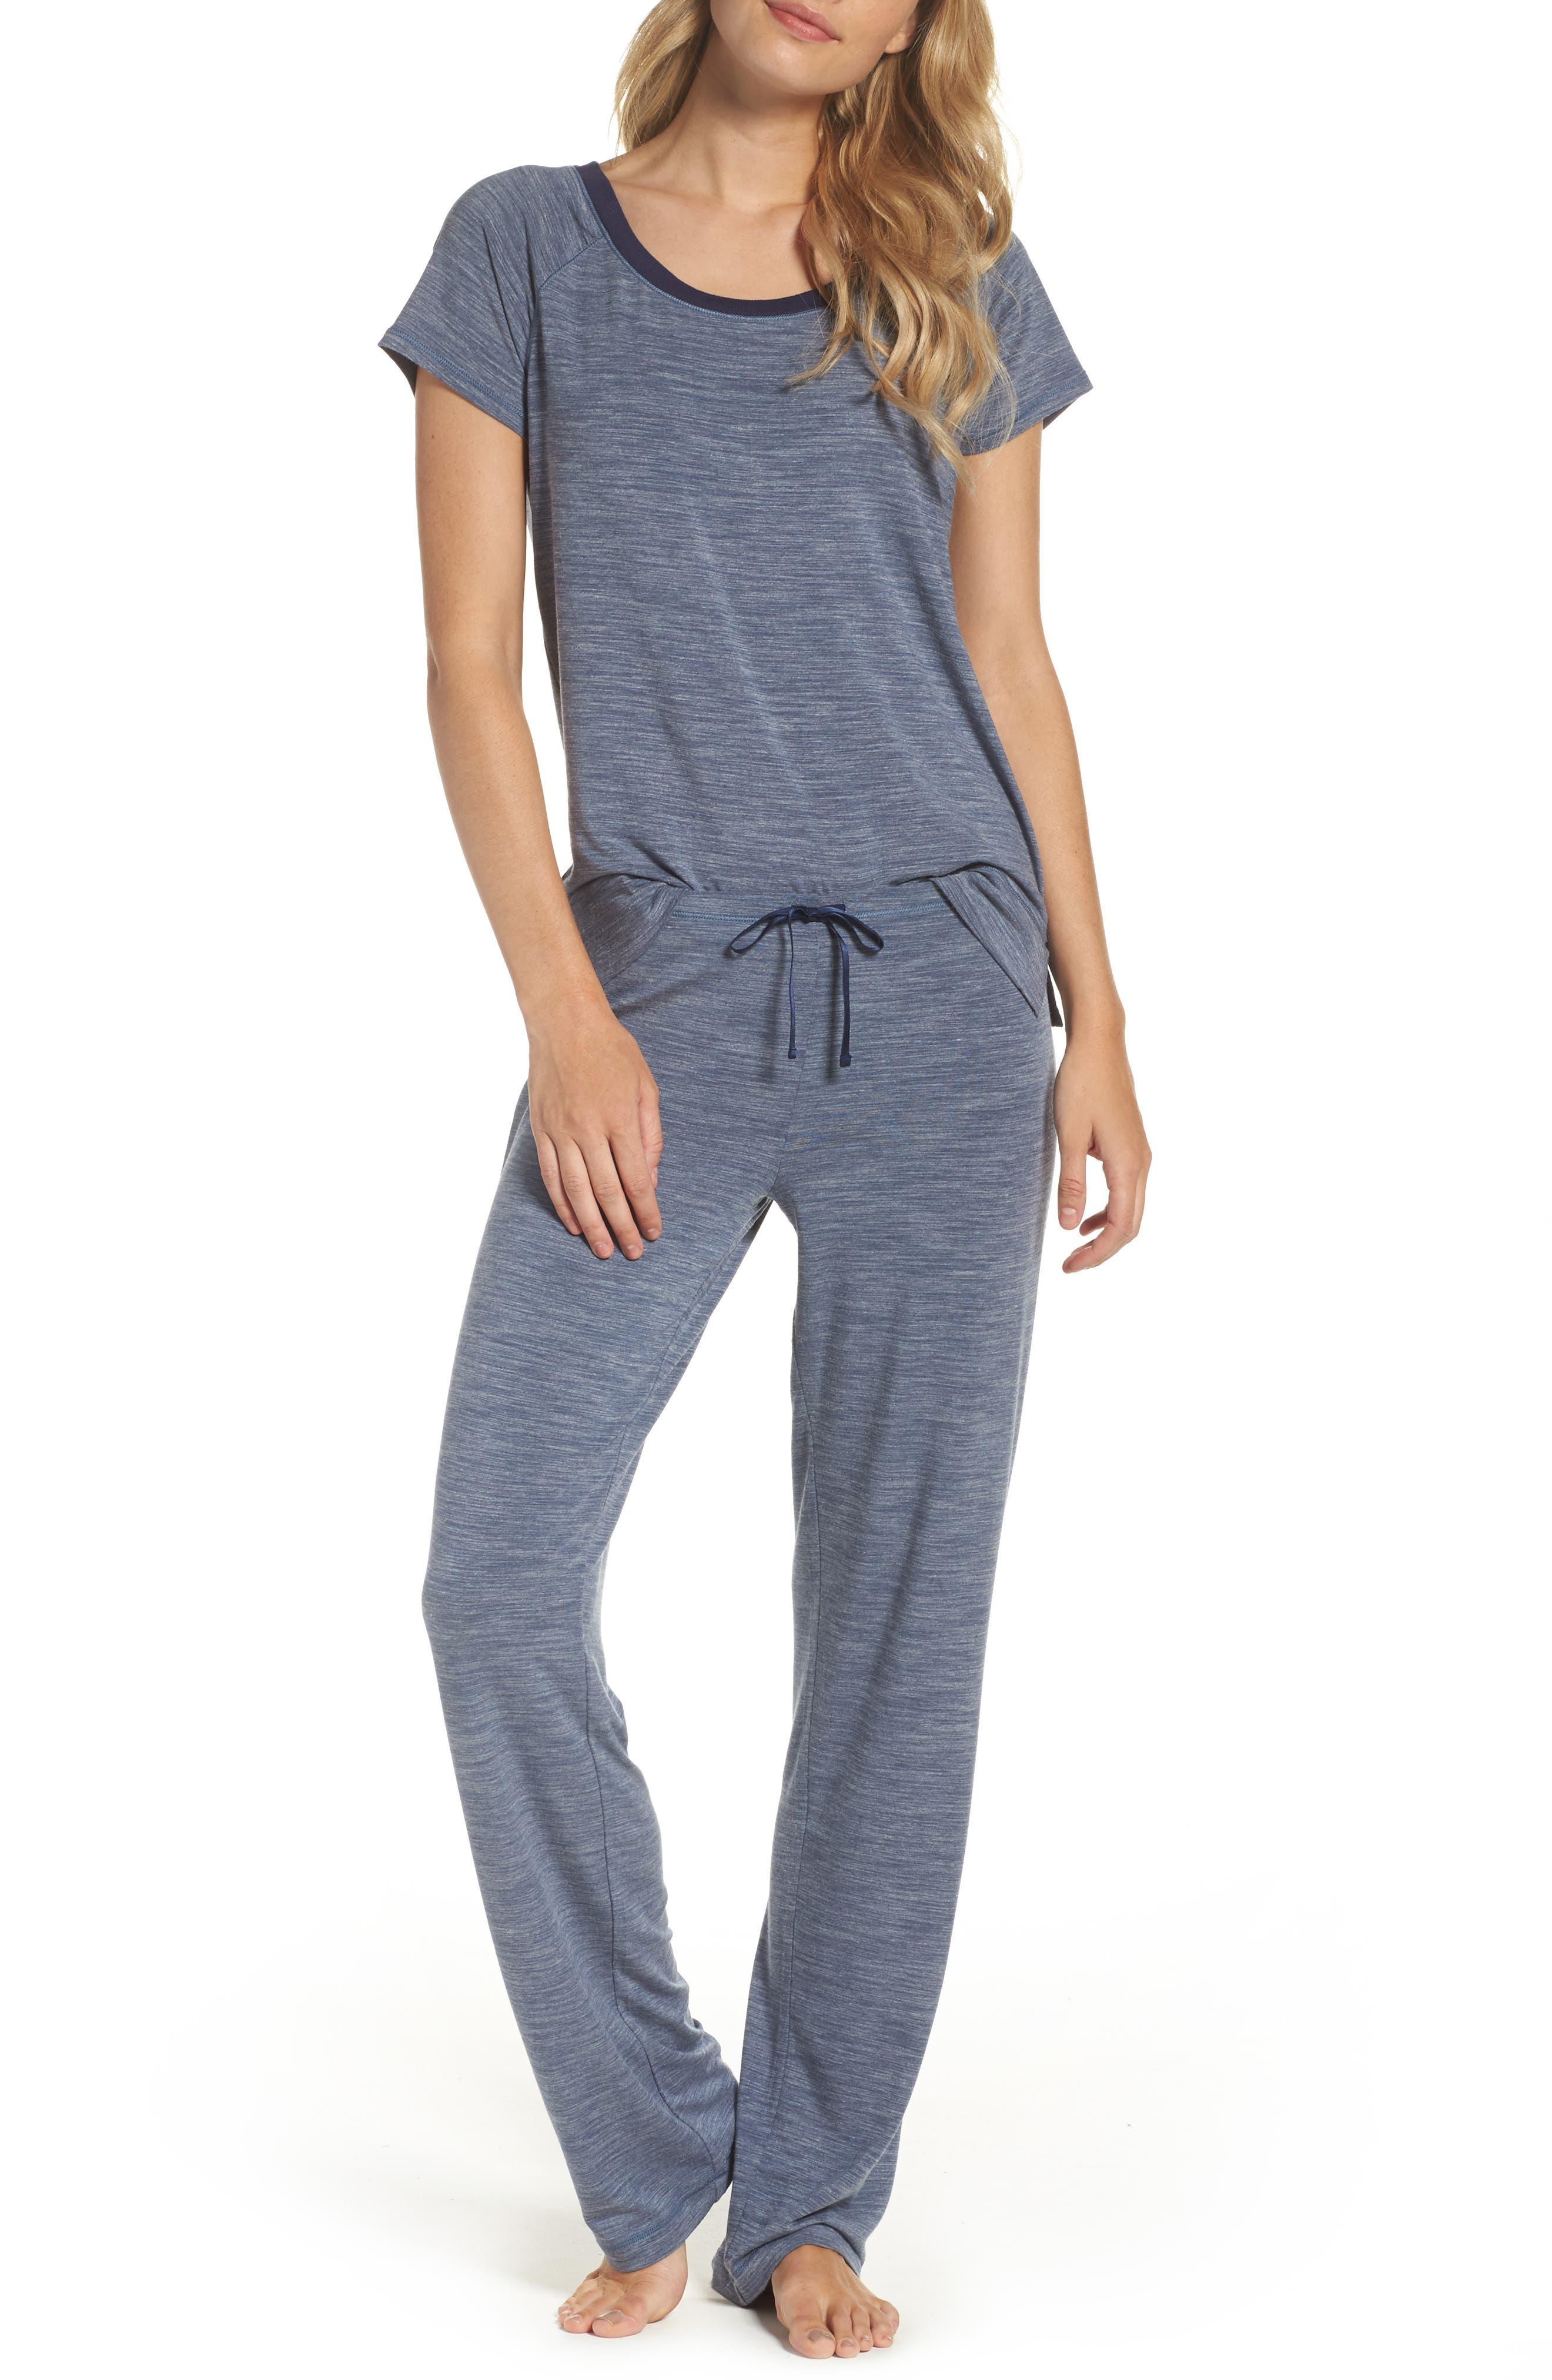 DKNY Lounge Top & Pants